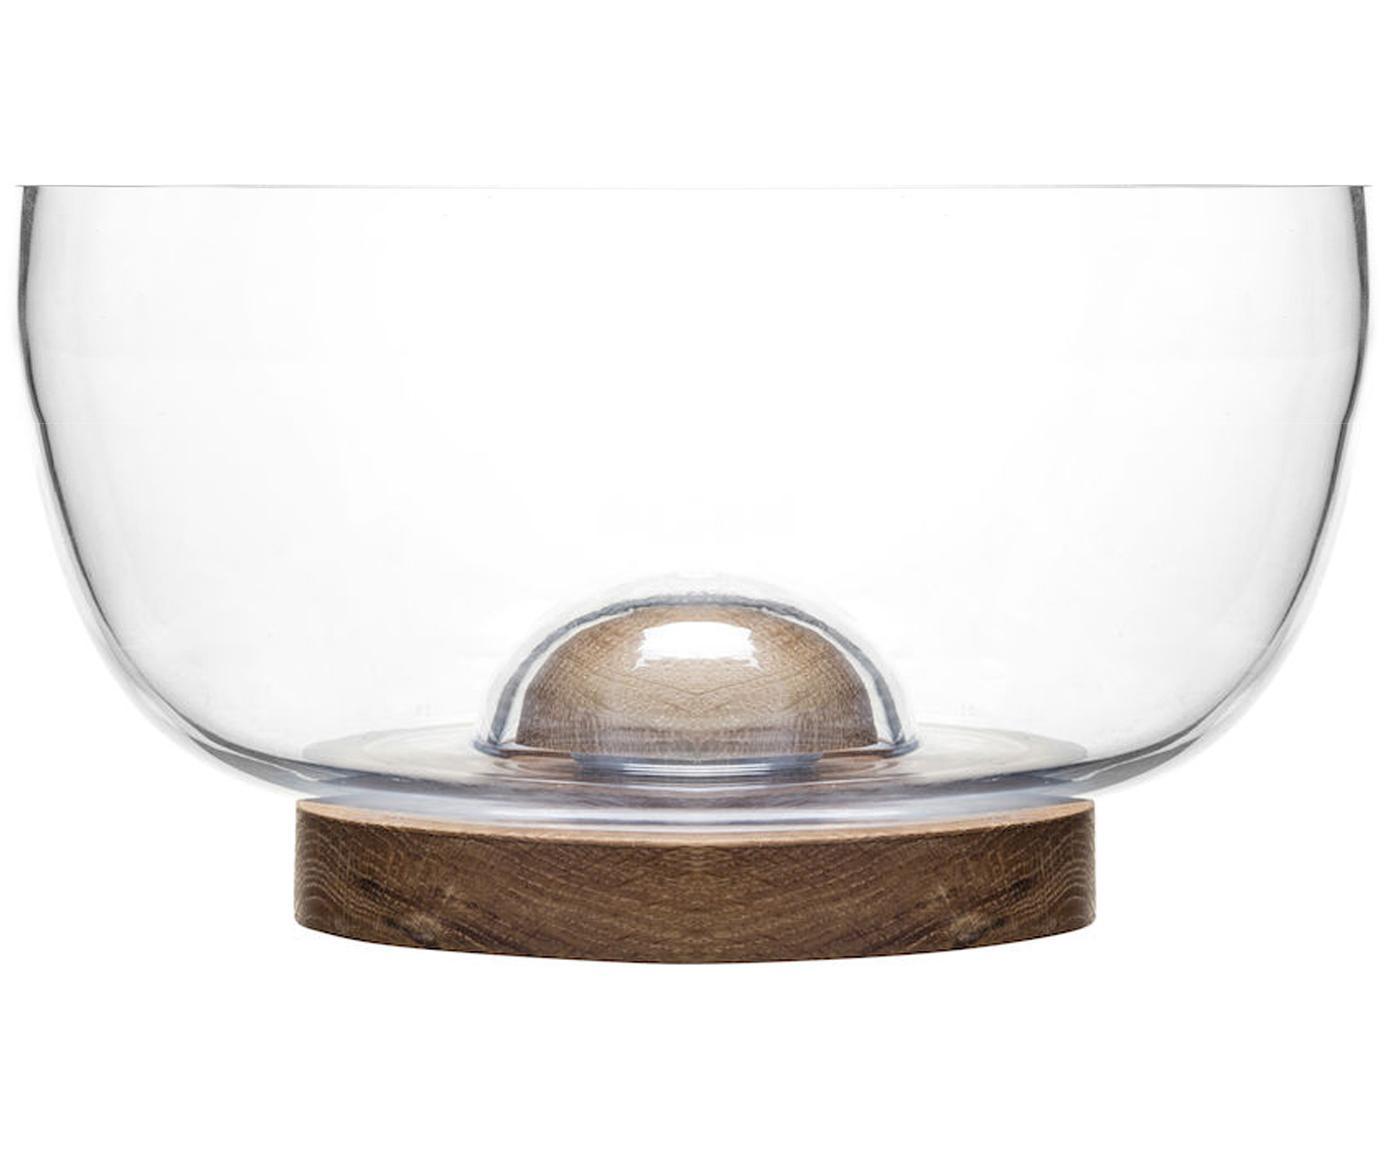 Saladeschaal Eden van glas en eikenhout, Eikenhout, glas, Transparent, eikenhoutkleurig, Ø 18 x H 10 cm